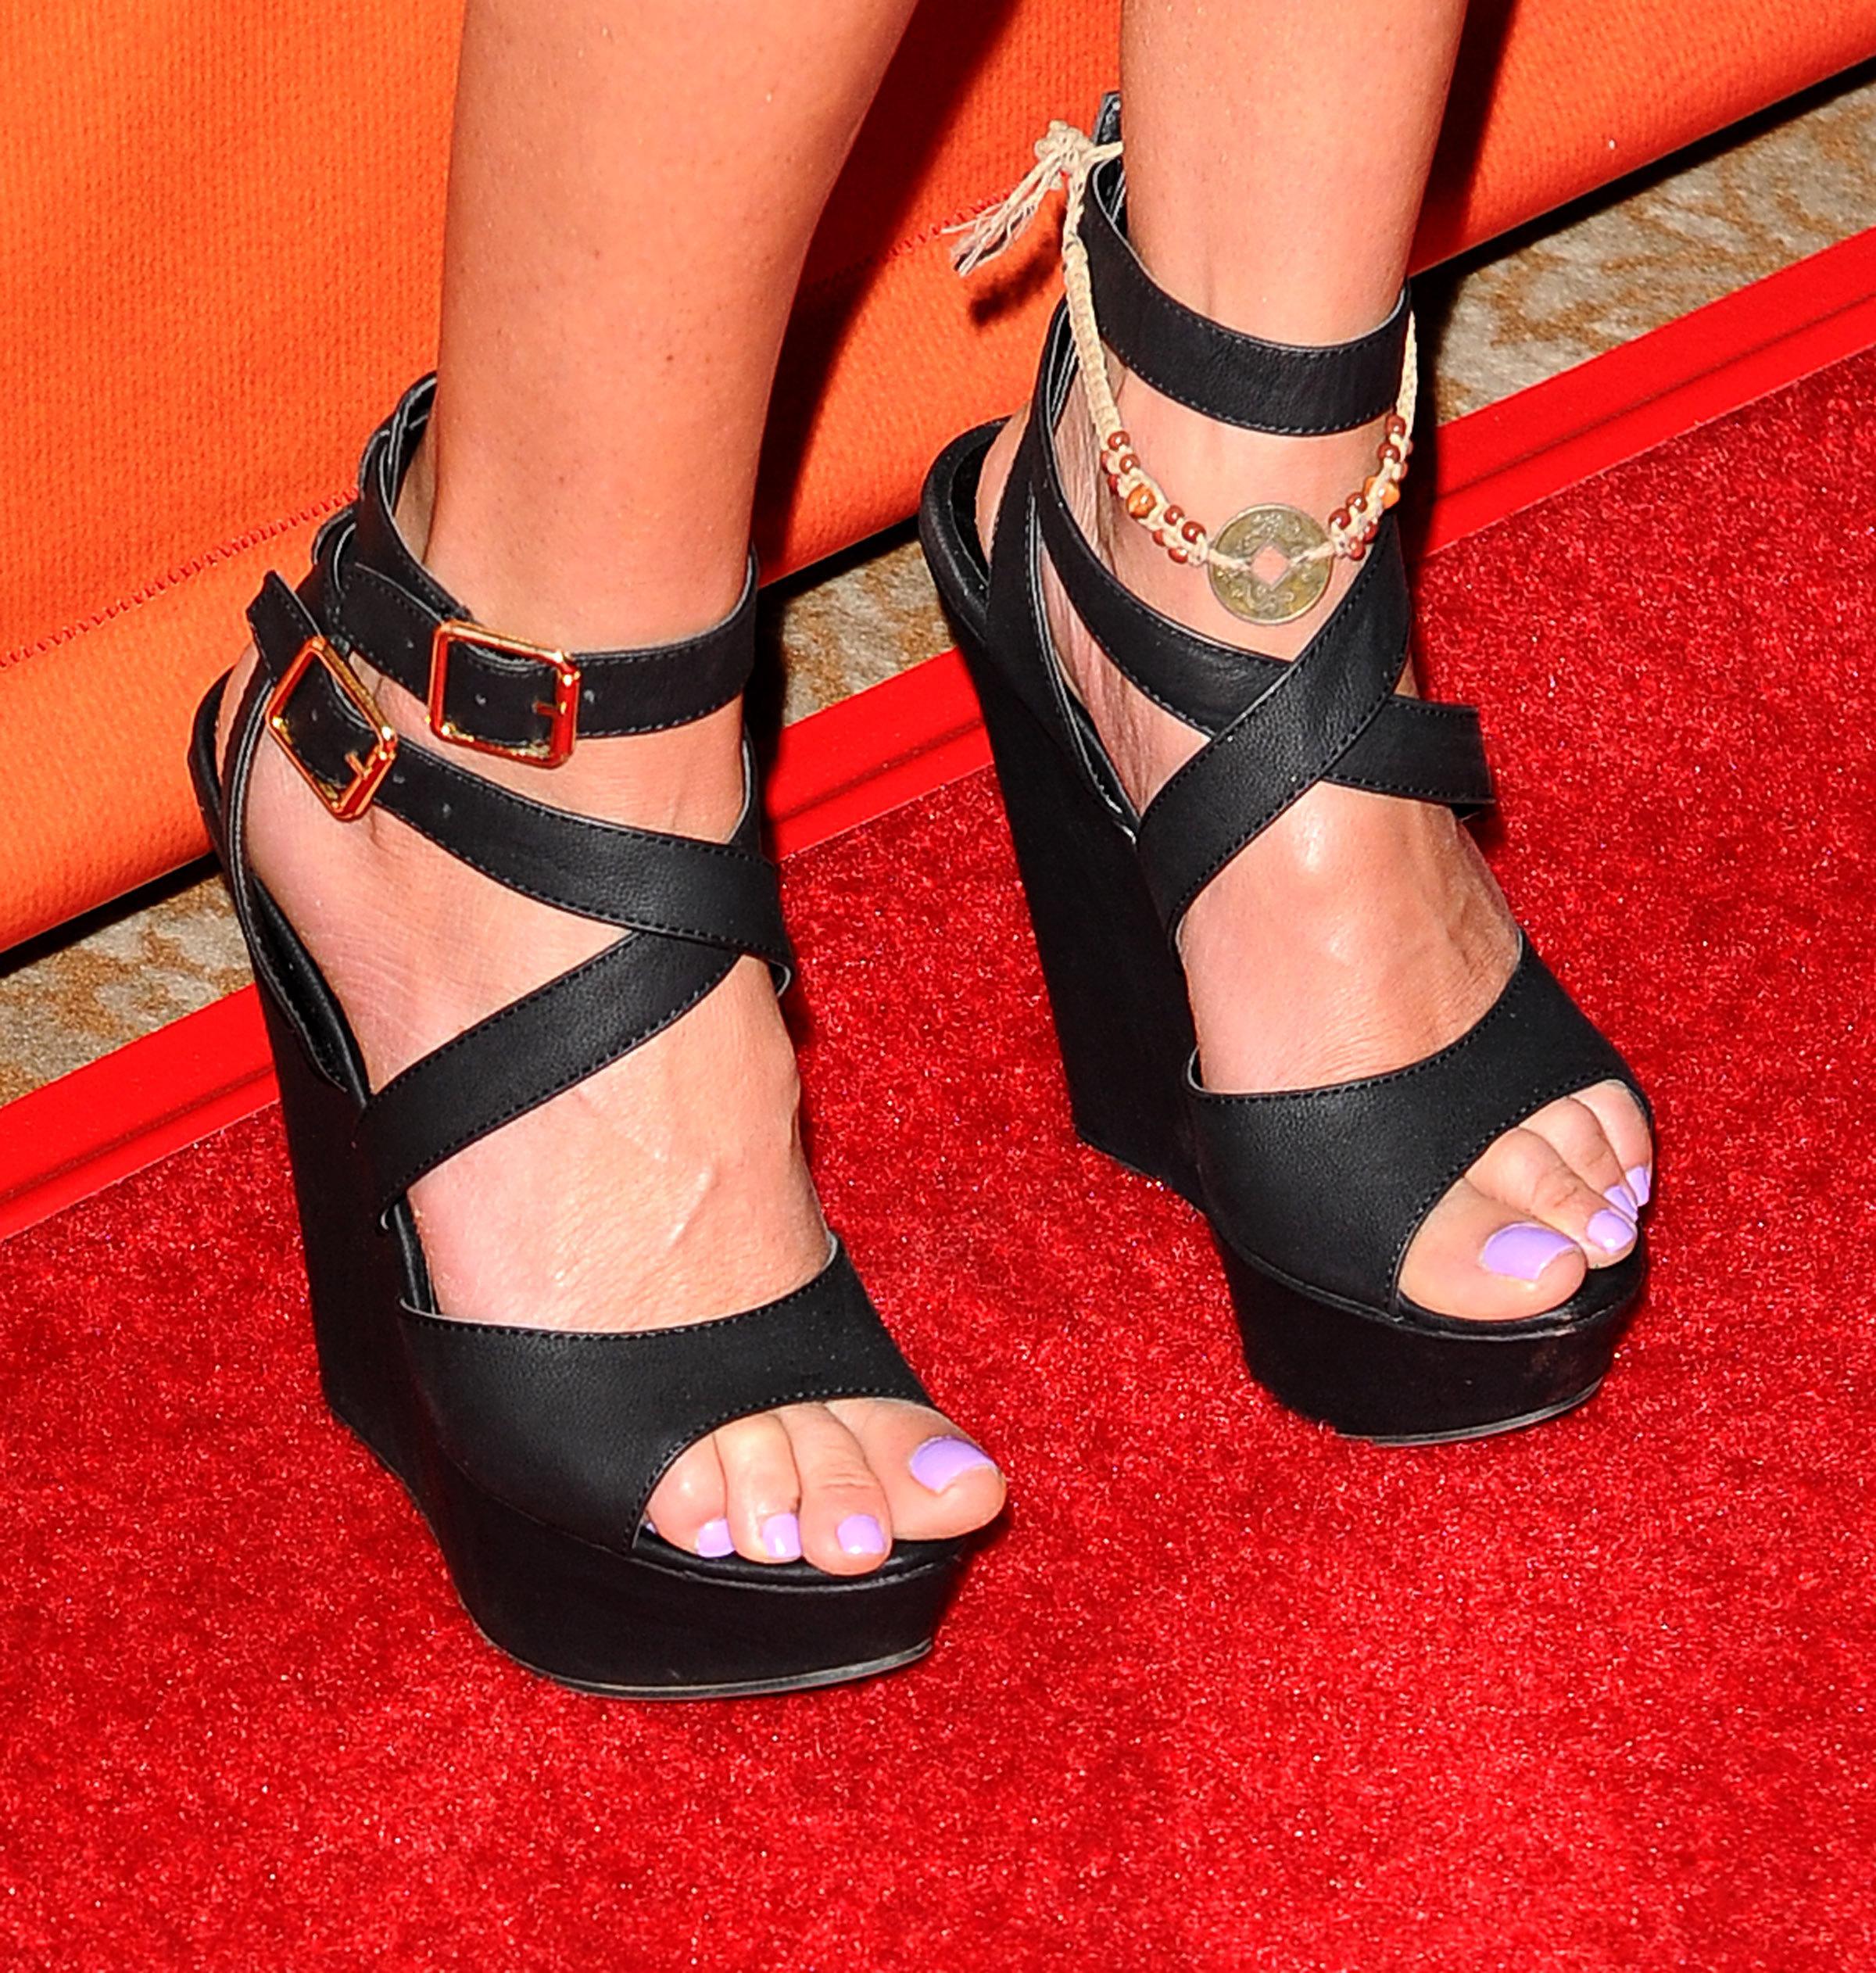 Tara Reids Feet